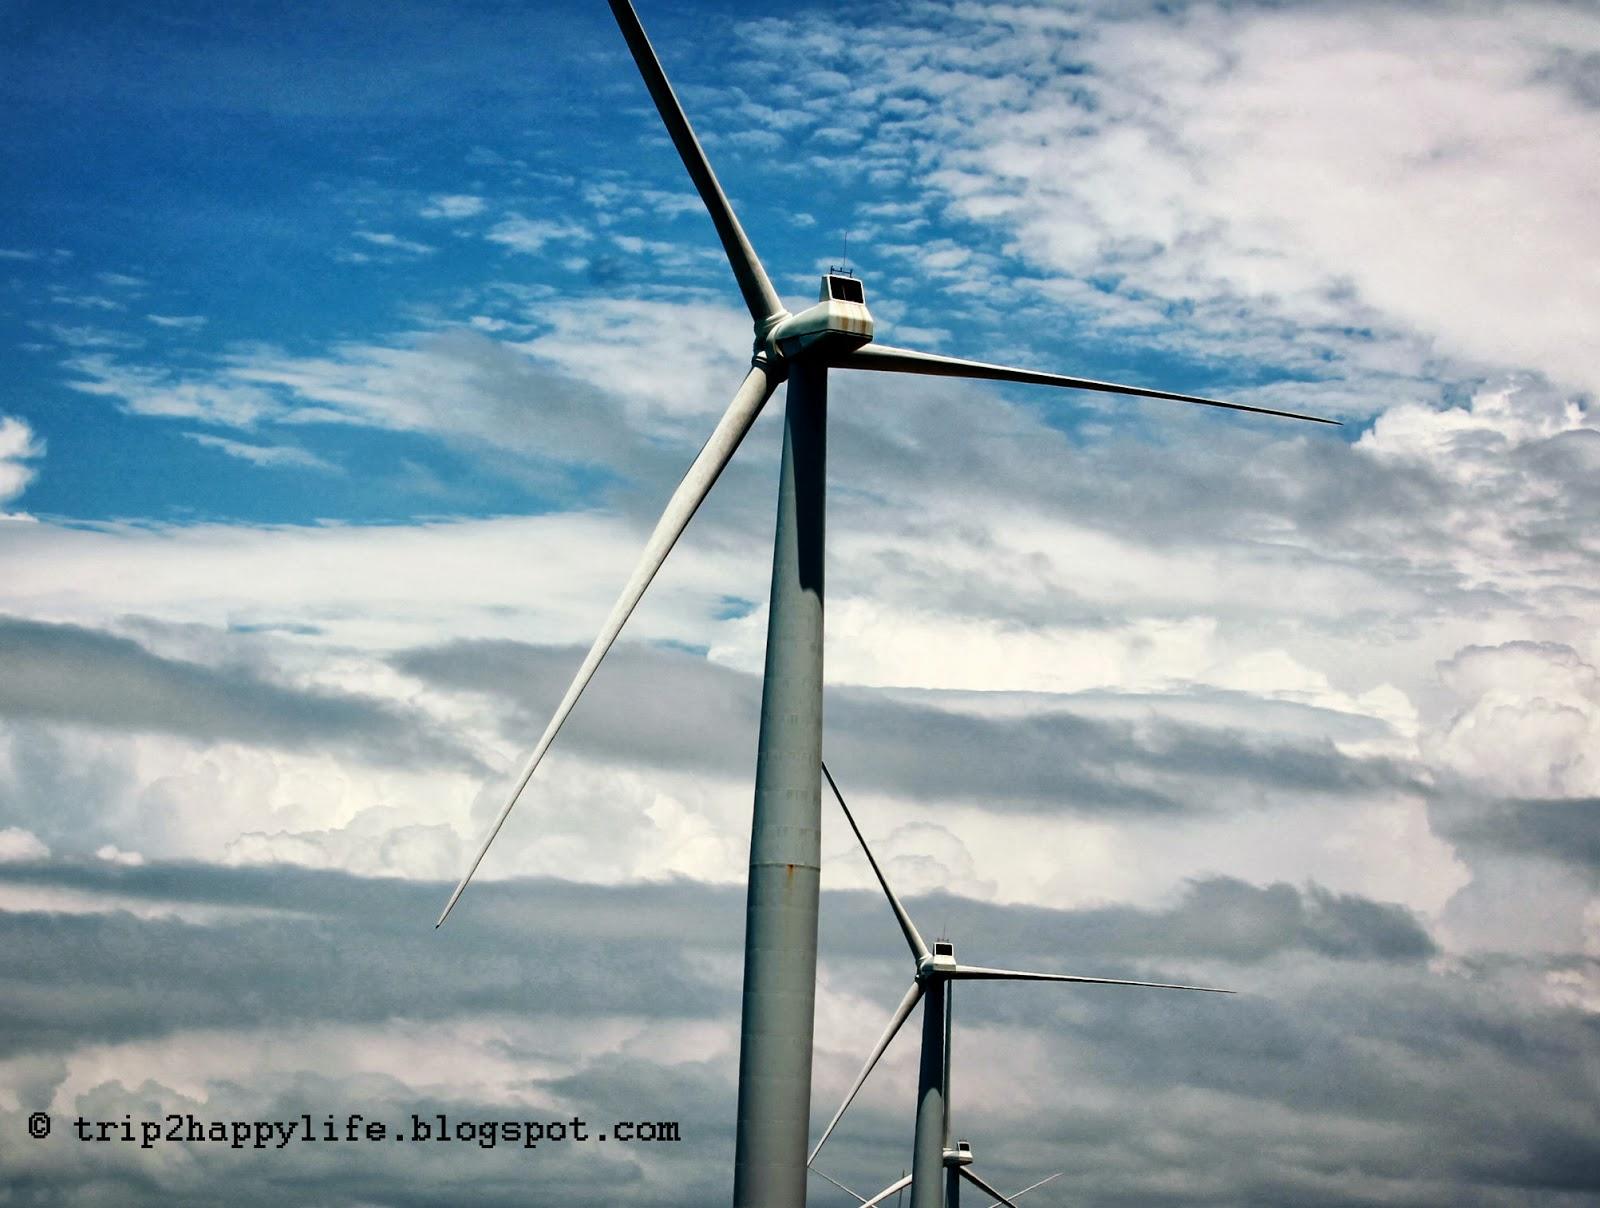 Assured, Photos of sexy windmills